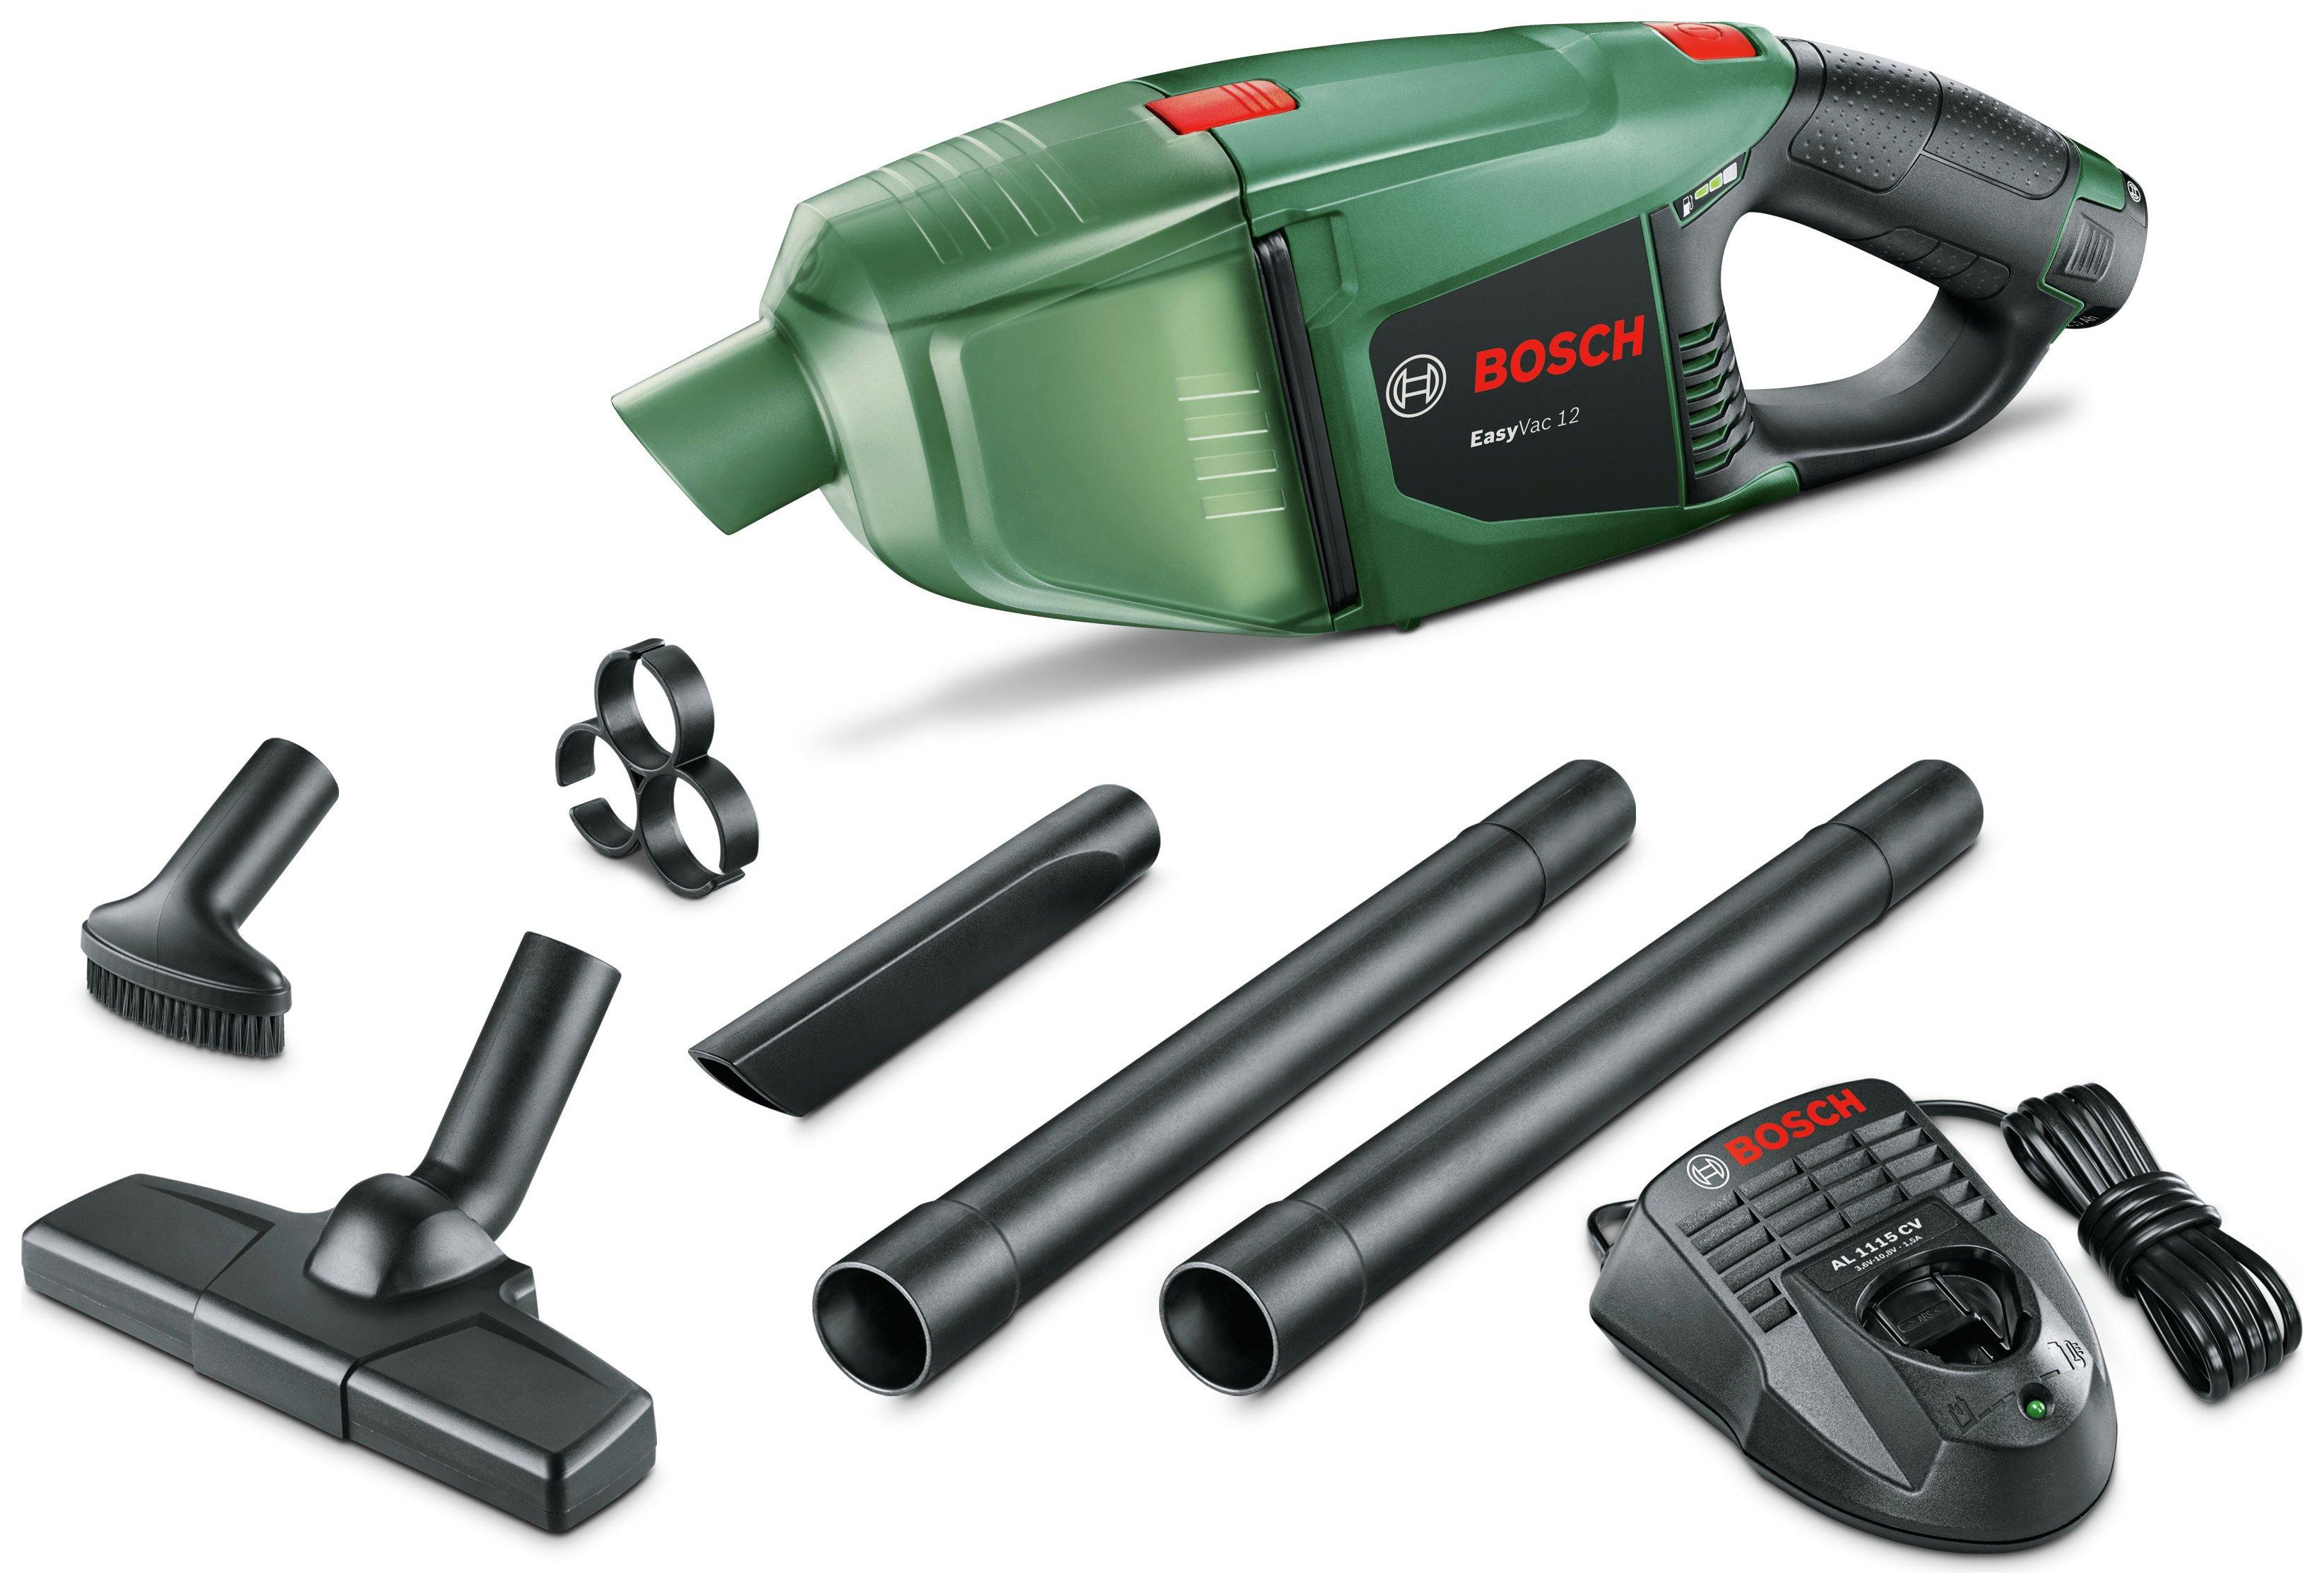 Bosch Bare Easy Vac Handheld Vacuum Cleaner - No Battery